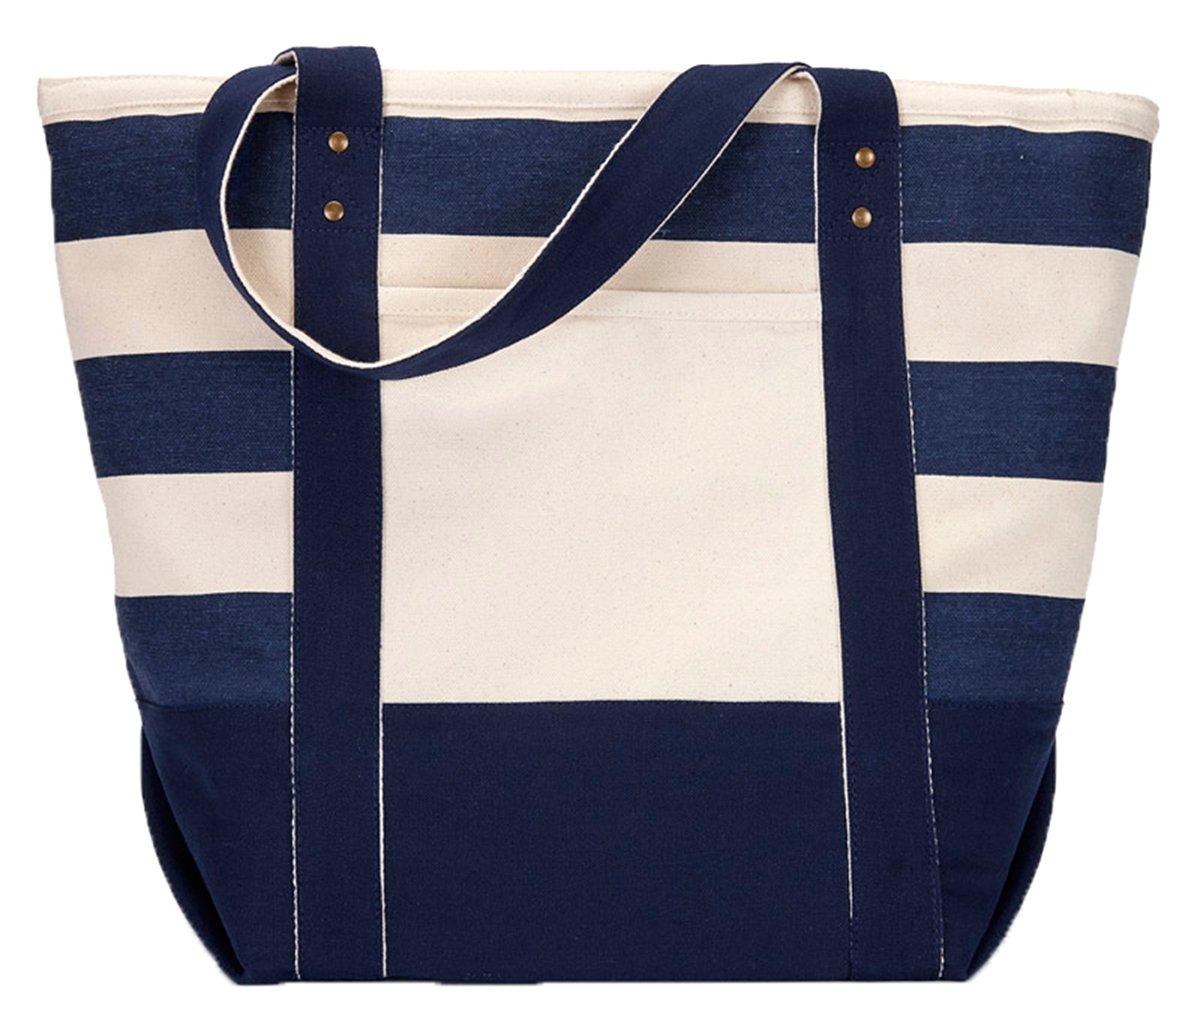 Gemline Seaside Zippered Cotton Tote, Navy/Blue Stripe, One Size